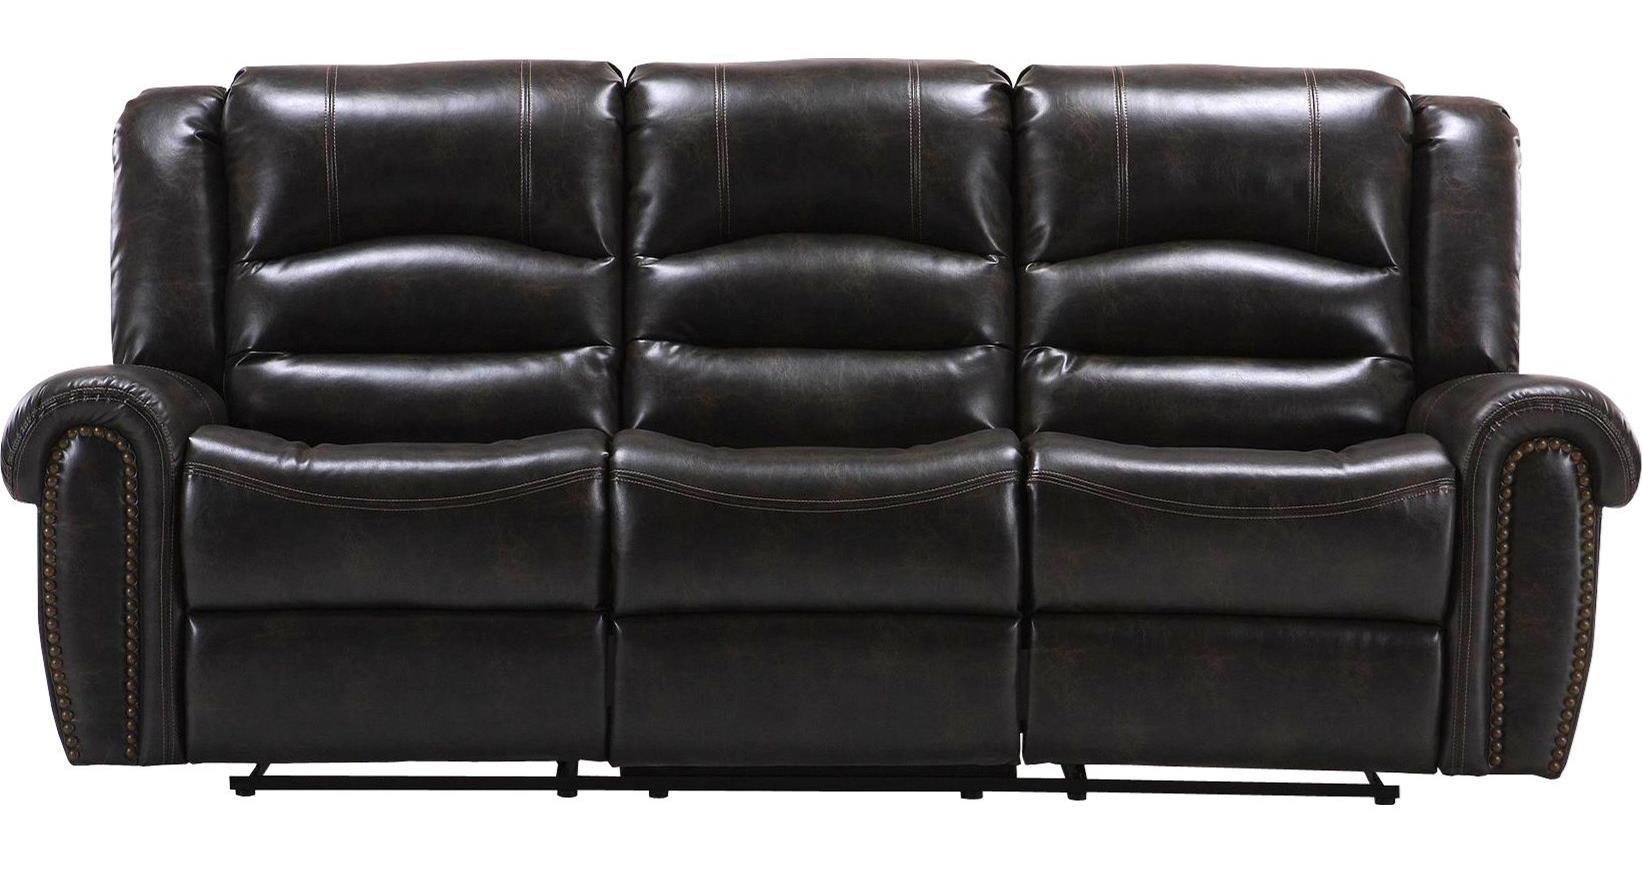 Parker Living Gershwin Power Reclining Dual Sofa - Item Number: MGER-832P-EM